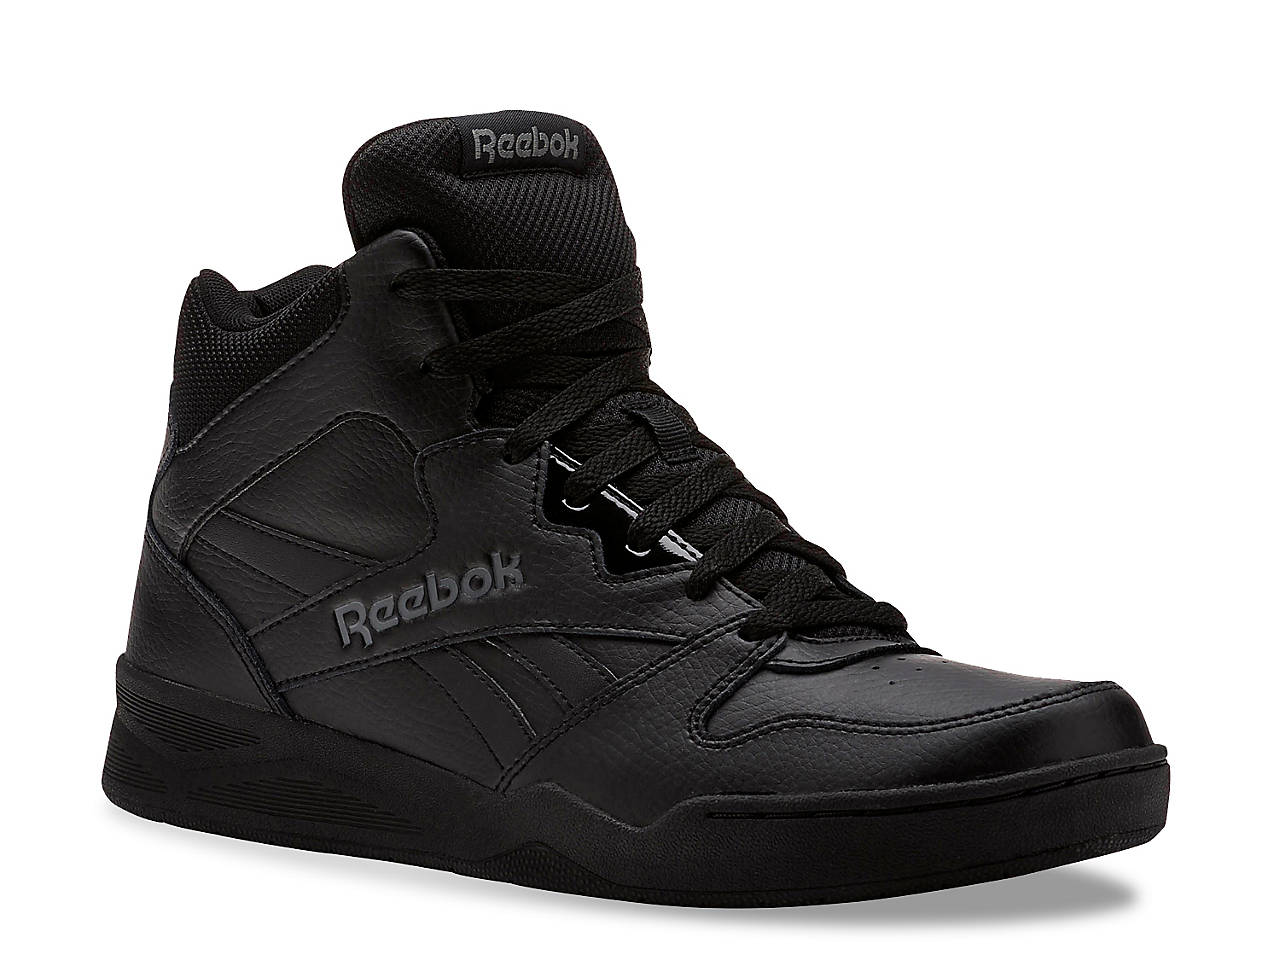 9cd1abb1cc Royal High-Top Sneaker - Men's